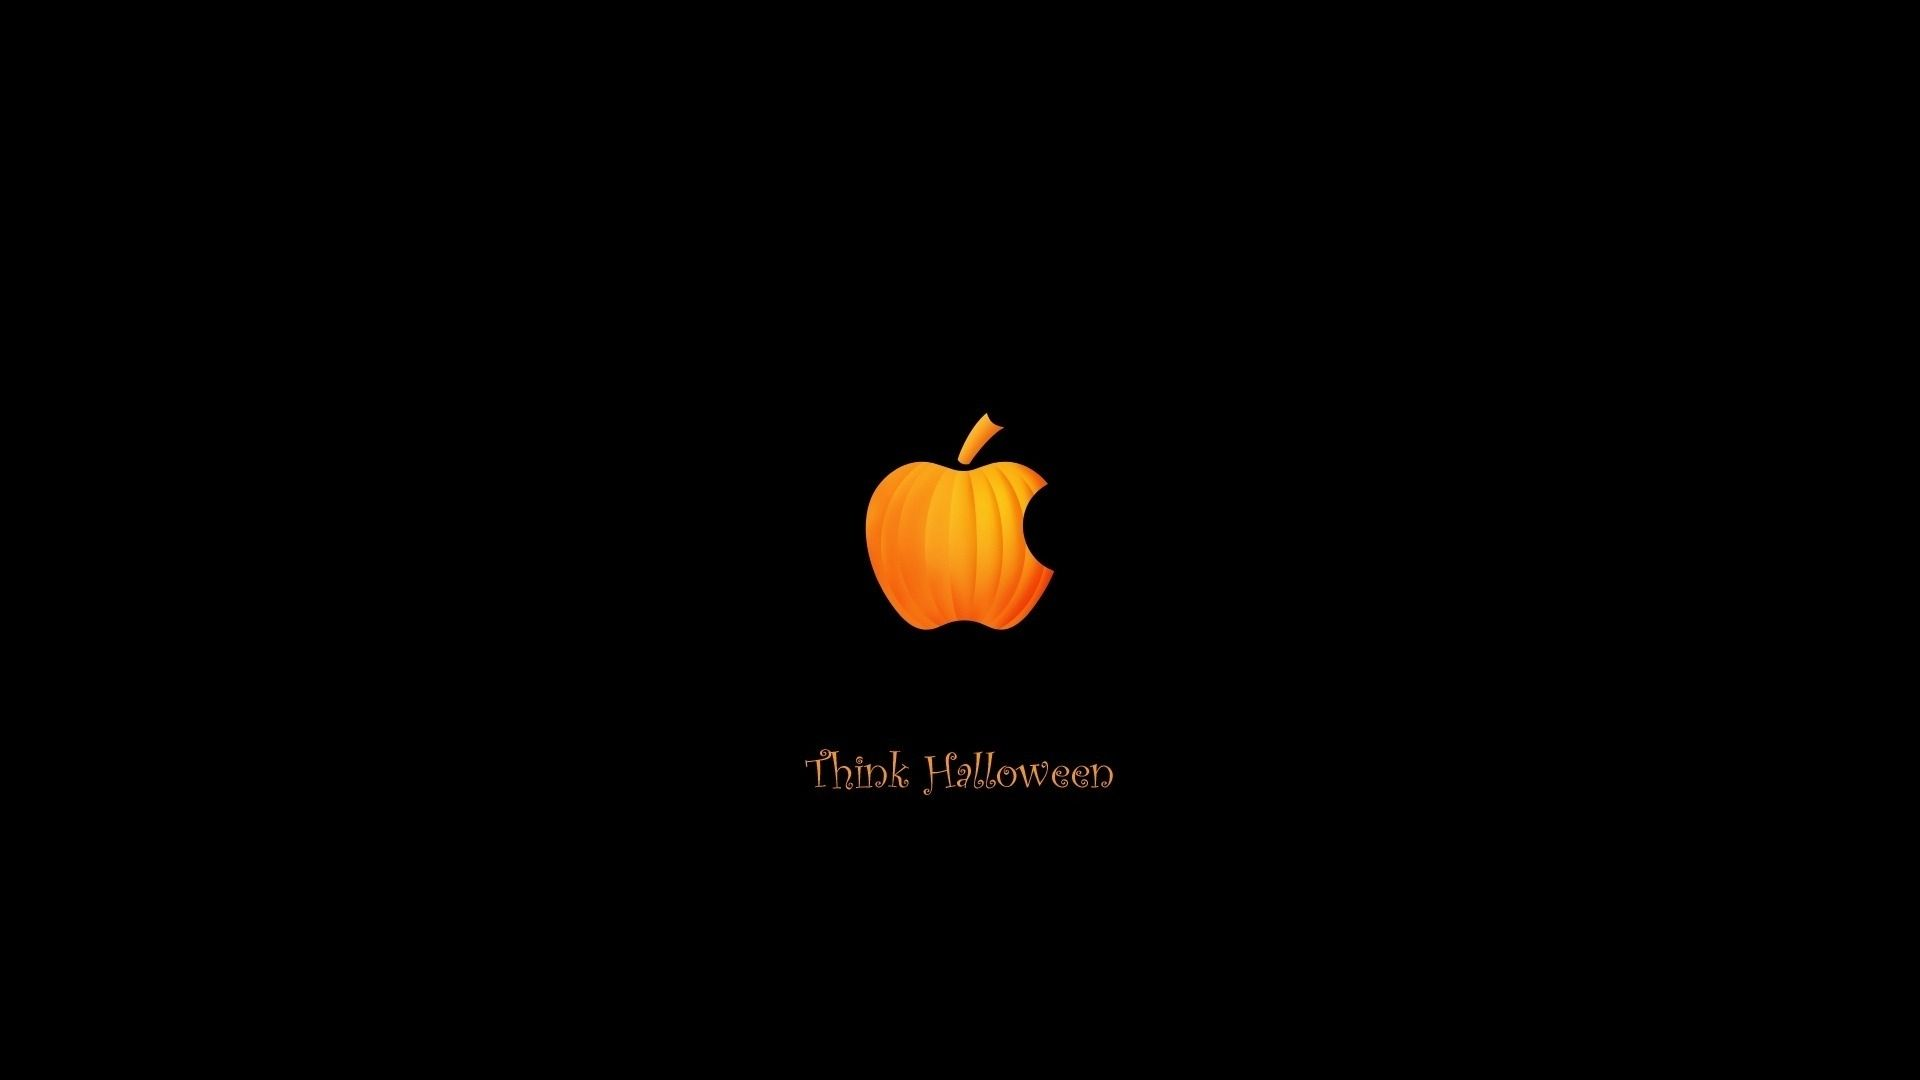 Popular Wallpaper Halloween Facebook - dd60795e1c104e3c8aeefed11dbc2fe1  2018_543580.jpg